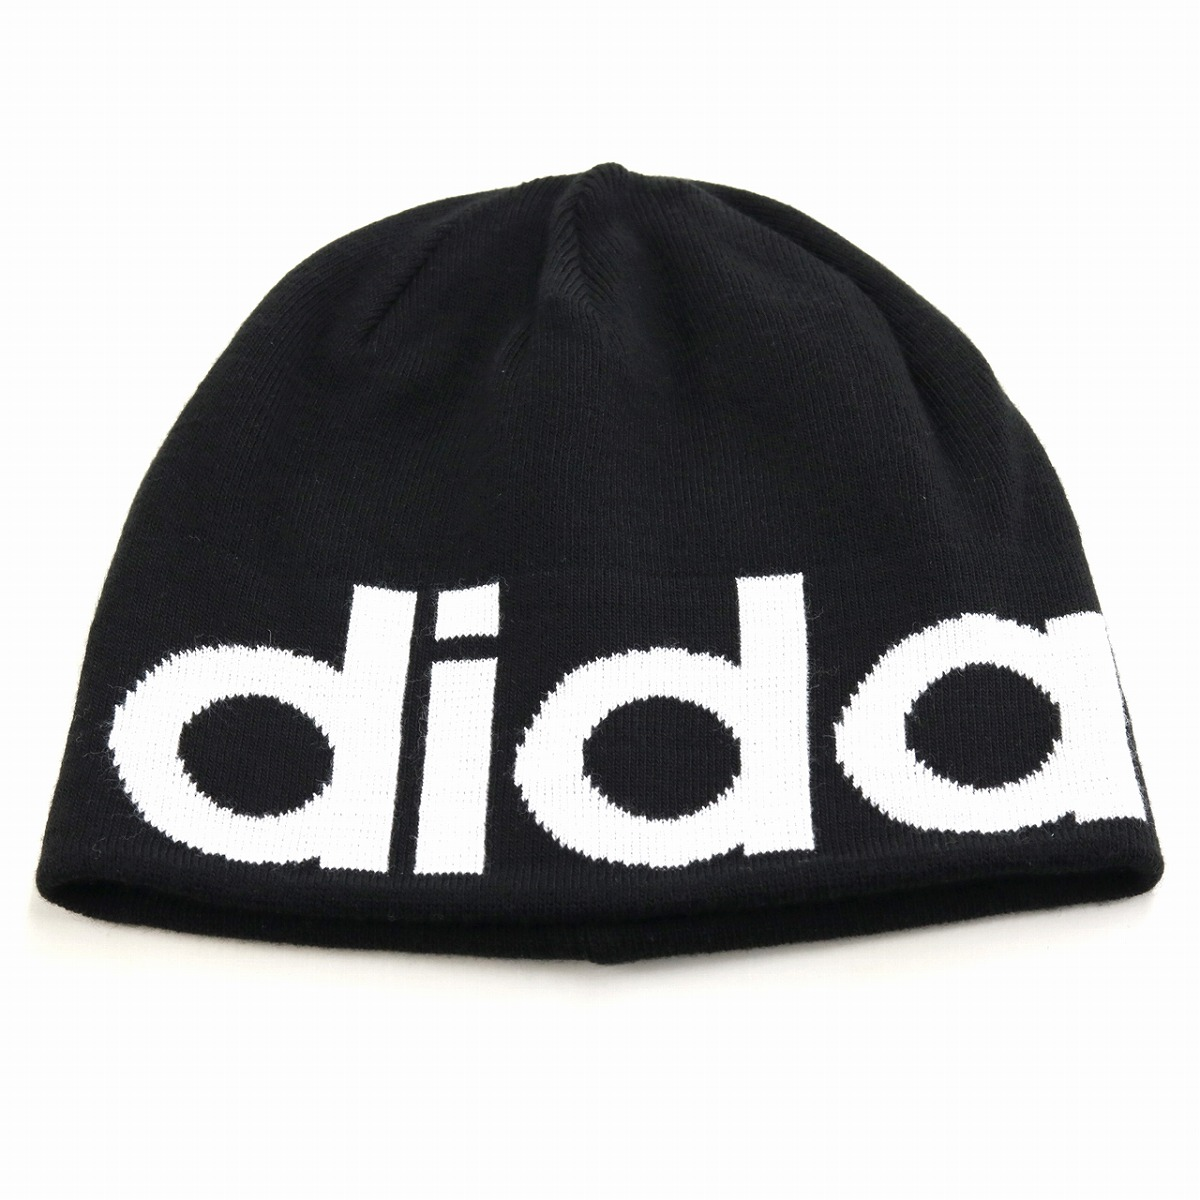 d52b9e1151d adidas knit hat 2way men beanie lapel ニットワッチ hat Adidas knit hat brand logo  adidas knit cap Lady s sports MIX coordinates casual stylish trendy item ...